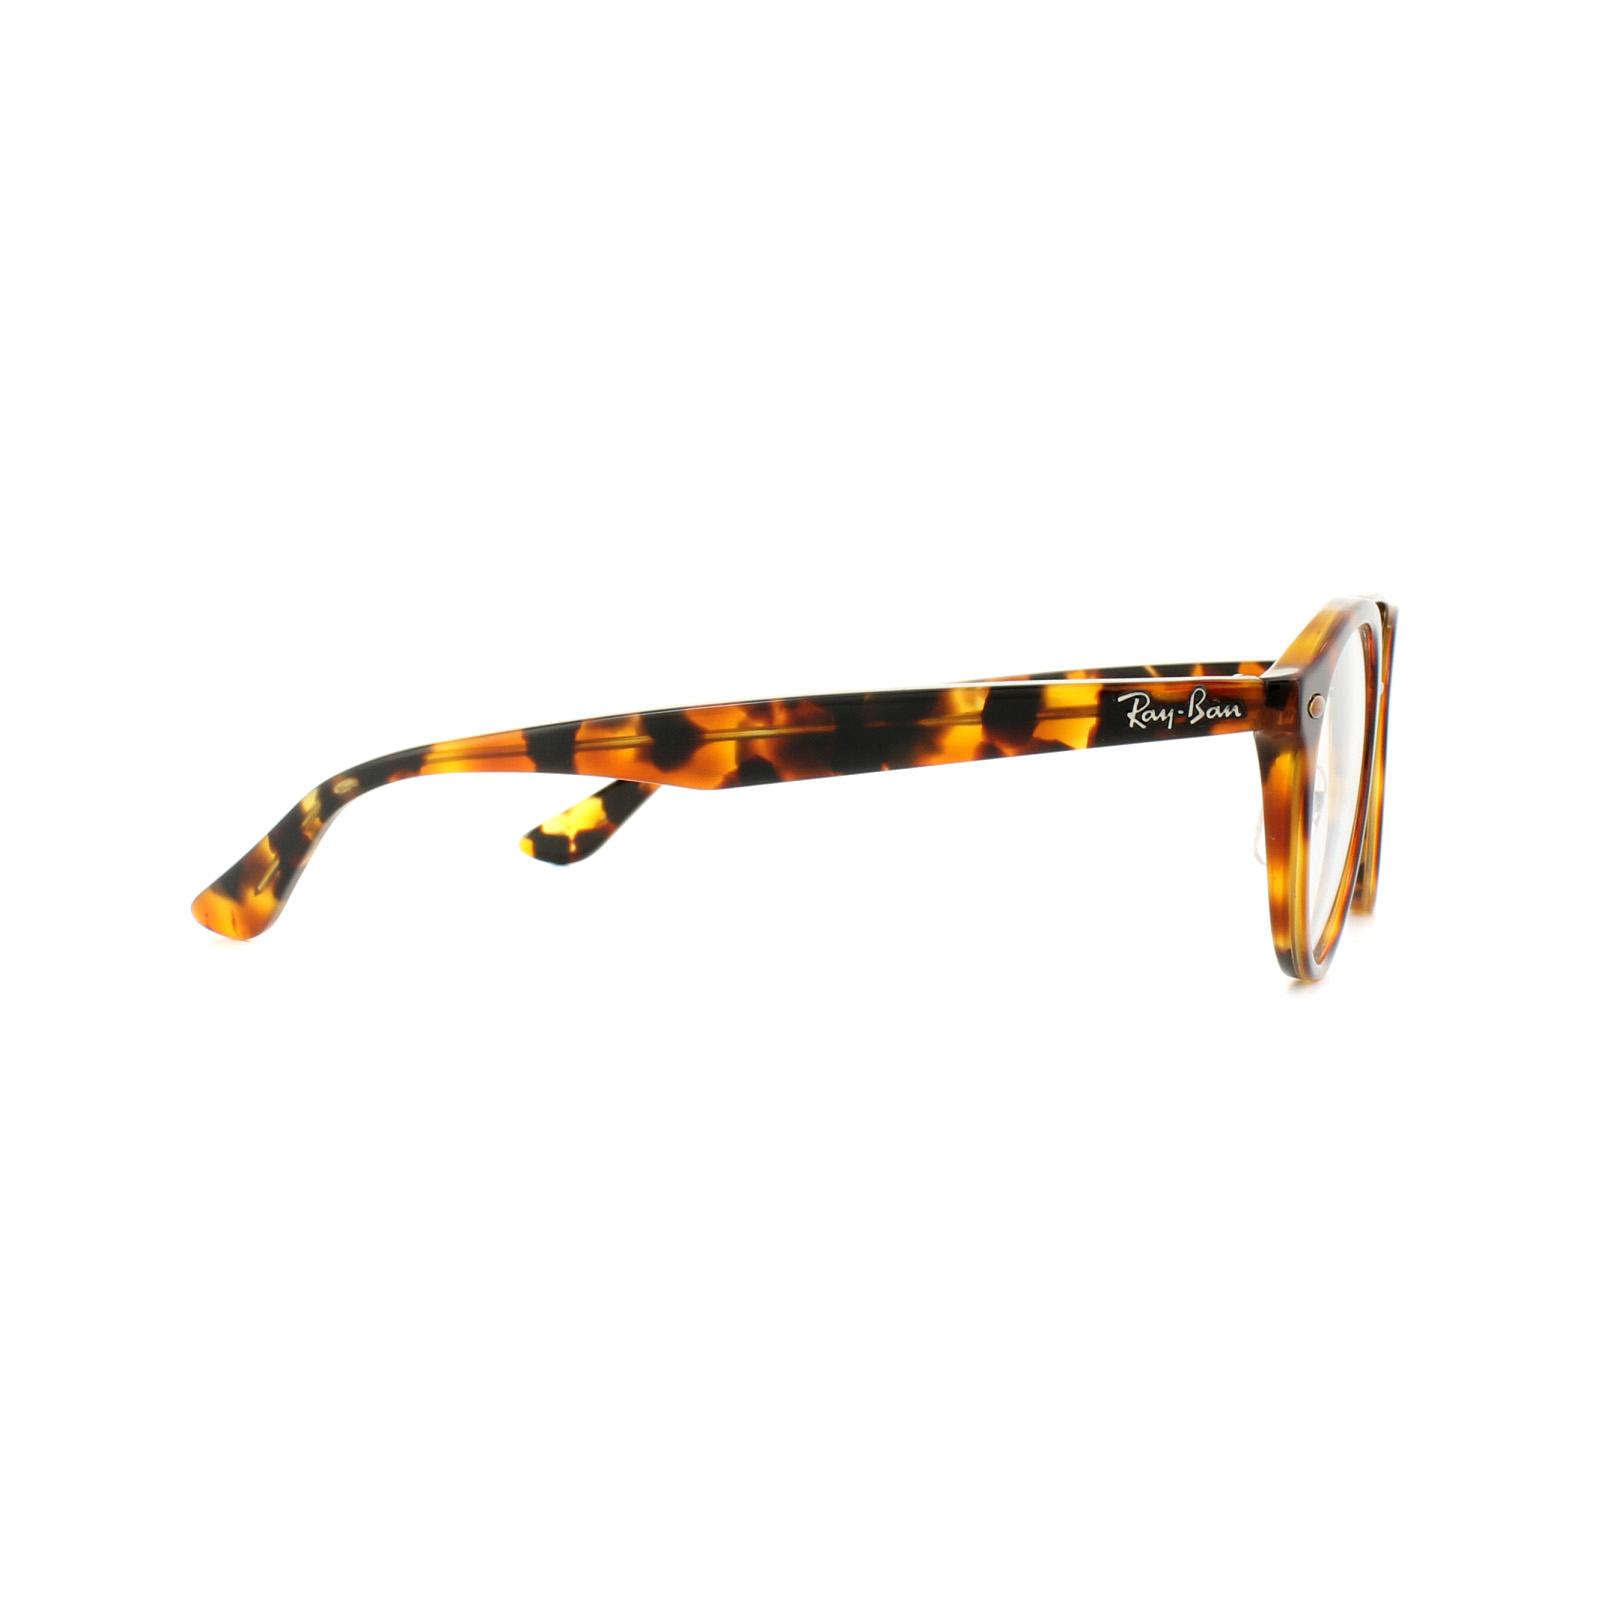 4996927259 Sentinel Ray-Ban Glasses Frames 5354 5675 Top Havana Brown Yellow Havana  50mm Mens Womens